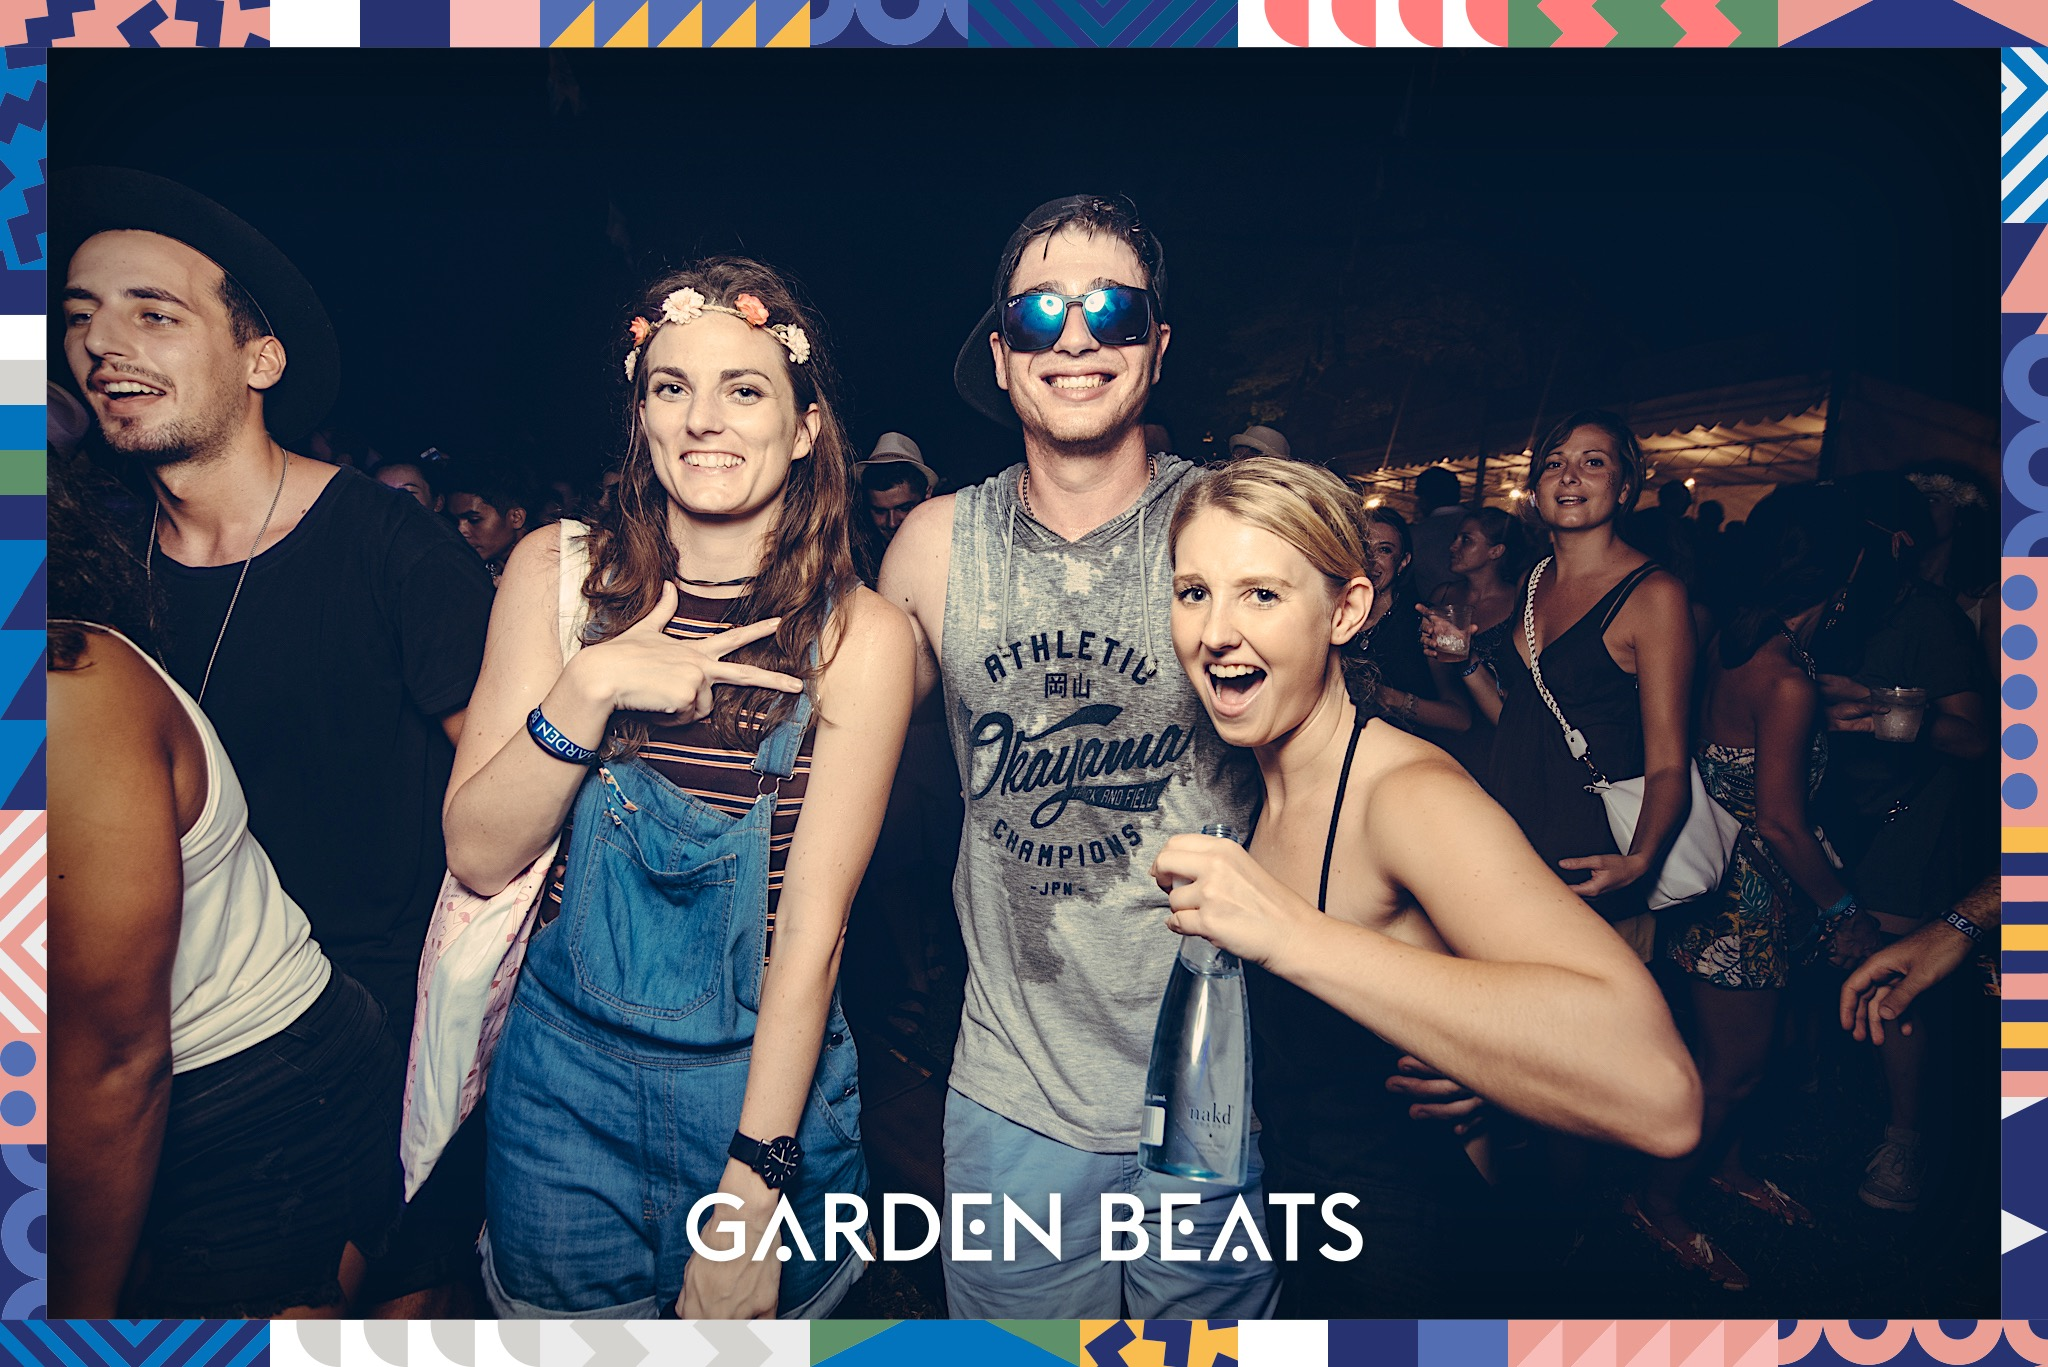 18032017_GardenBeats_Colossal785_WatermarkedGB.jpg